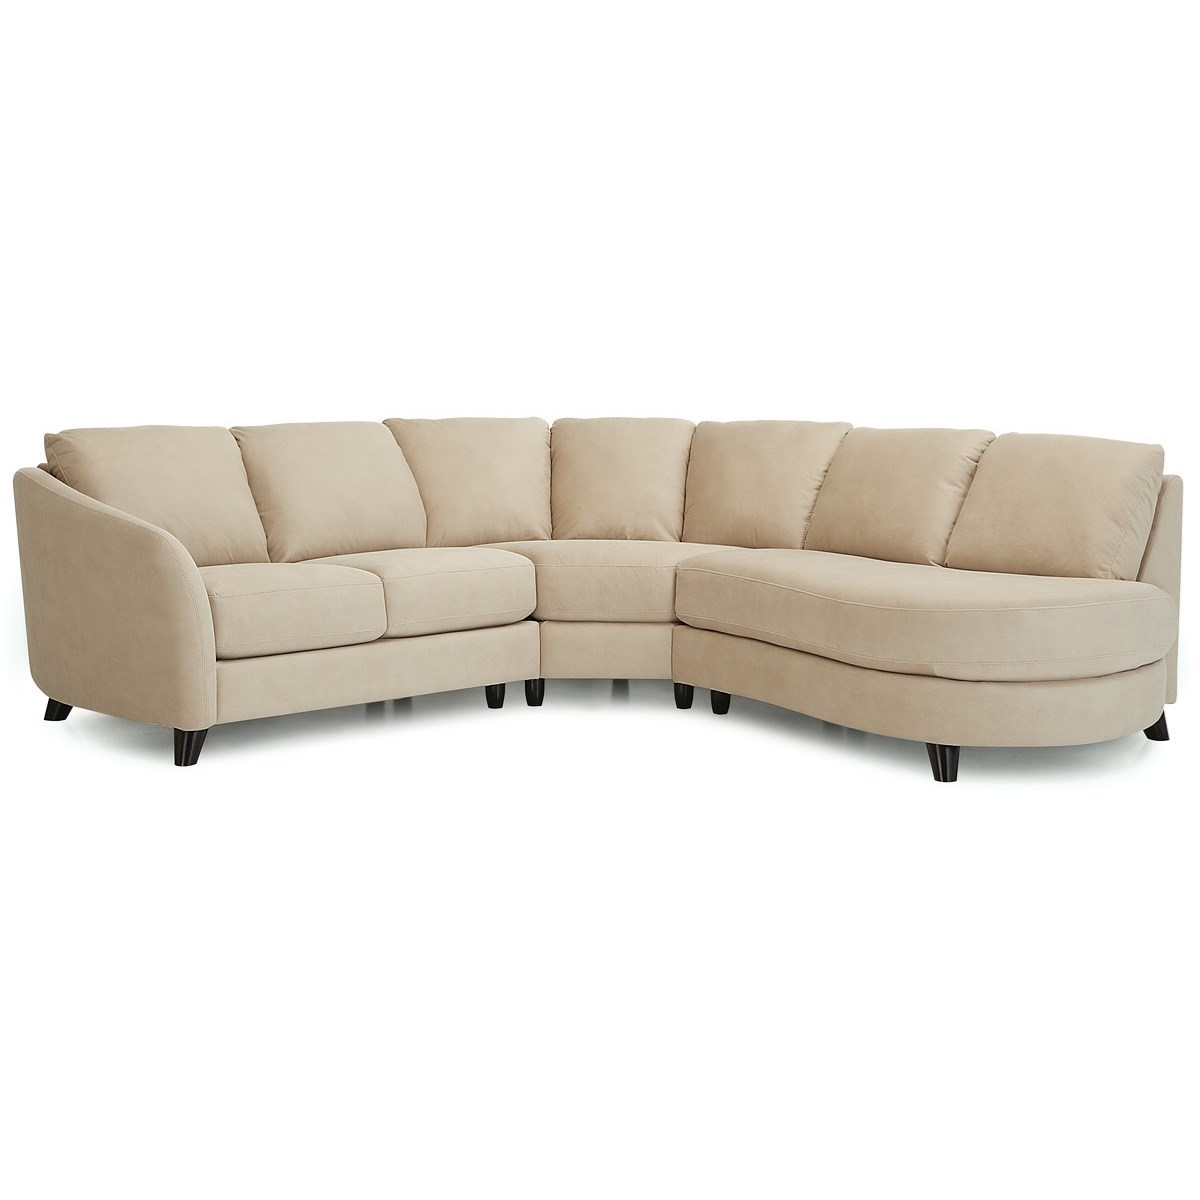 Alula Sectional Sofa by Palliser at Novello Home Furnishings